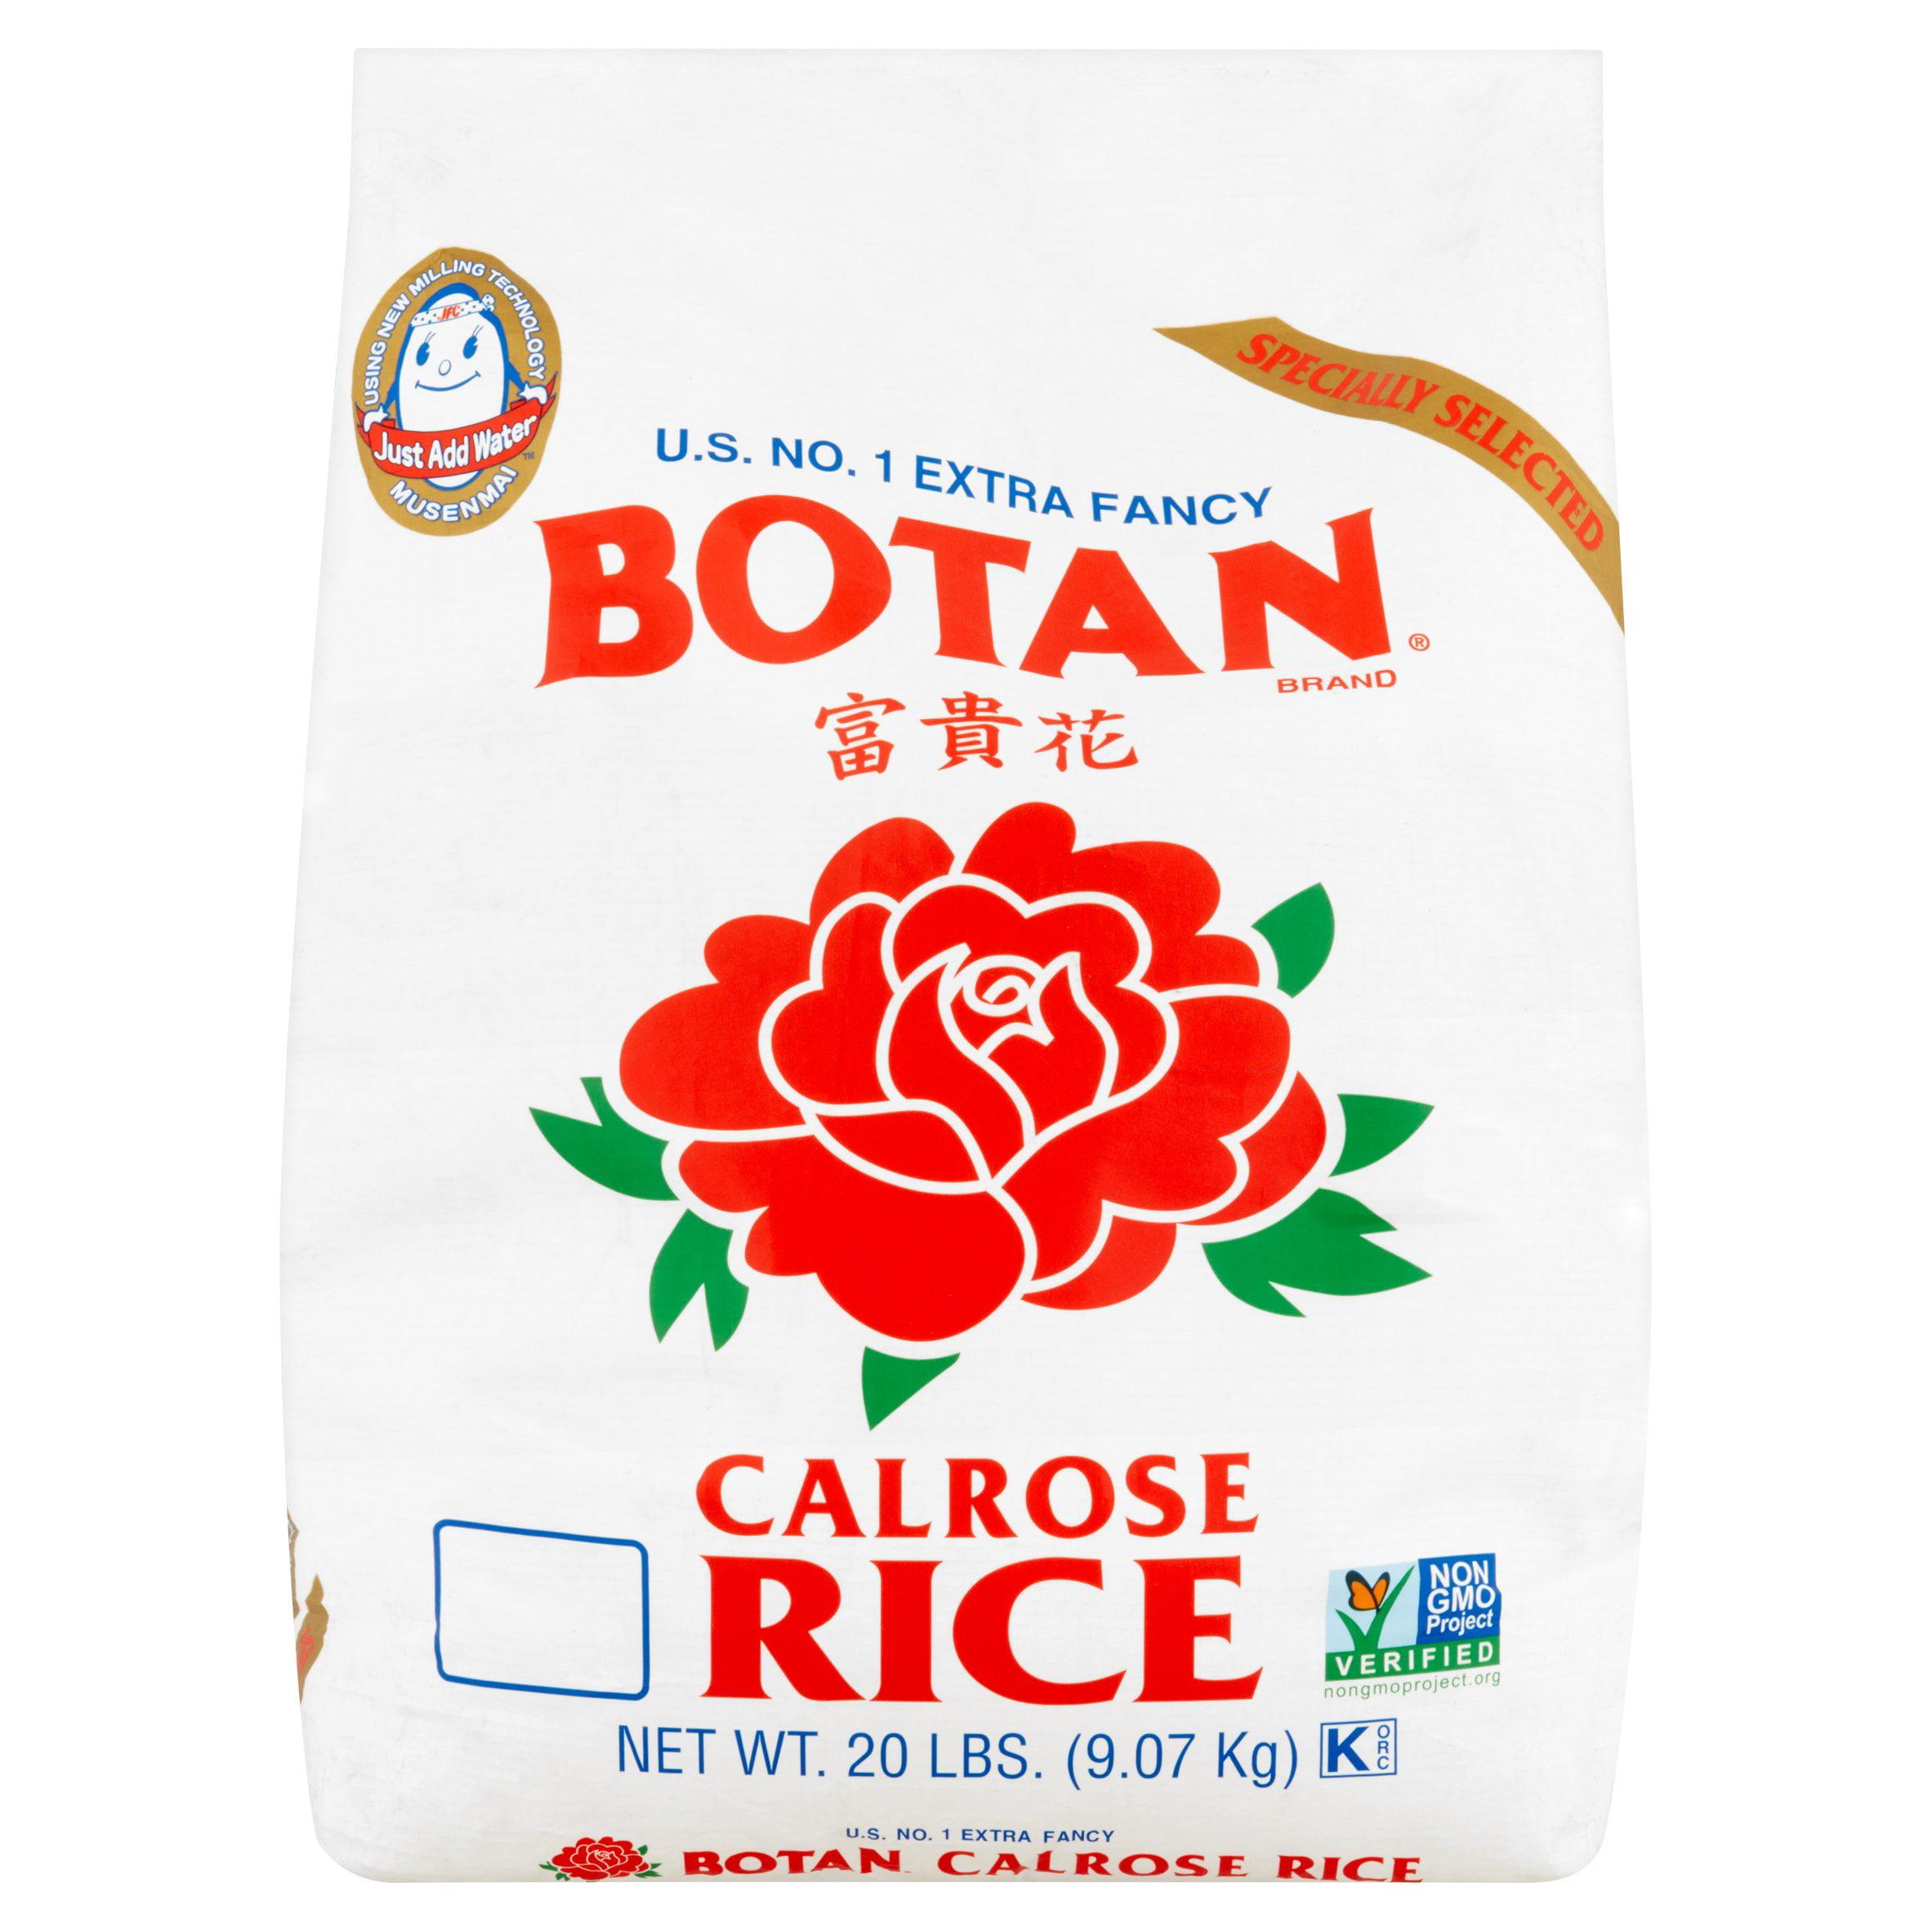 Botan Extra Fancy Calrose Rice, 20lb - $0.87/lb